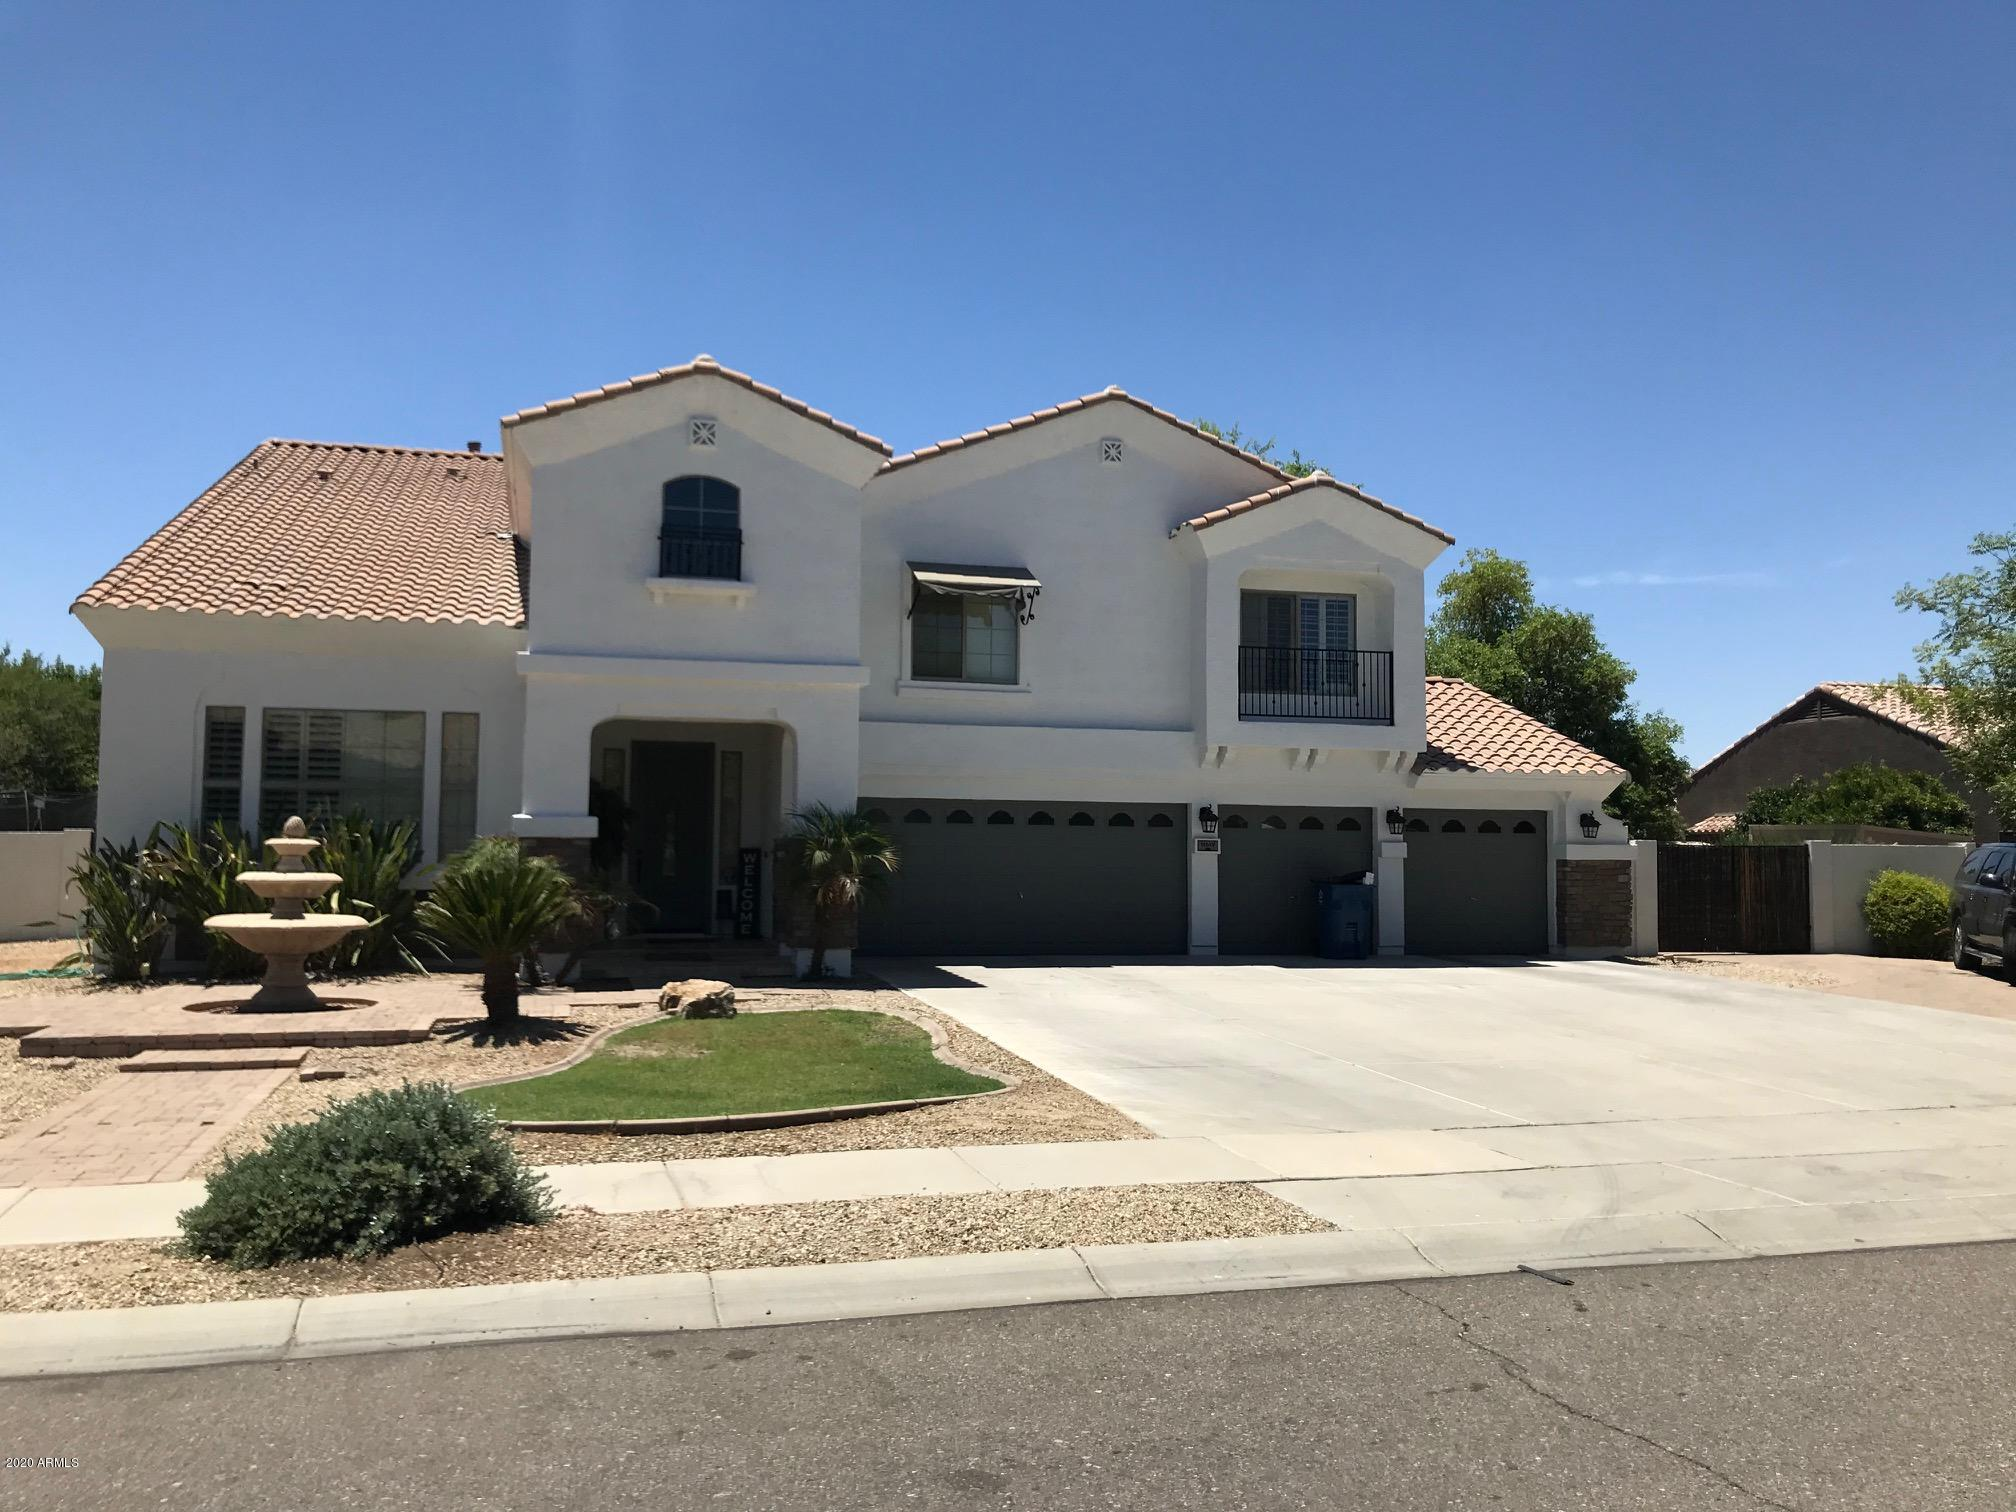 MLS 6053067 Chandler Metro Area, Chandler, AZ 85249 Chandler Homes for Rent